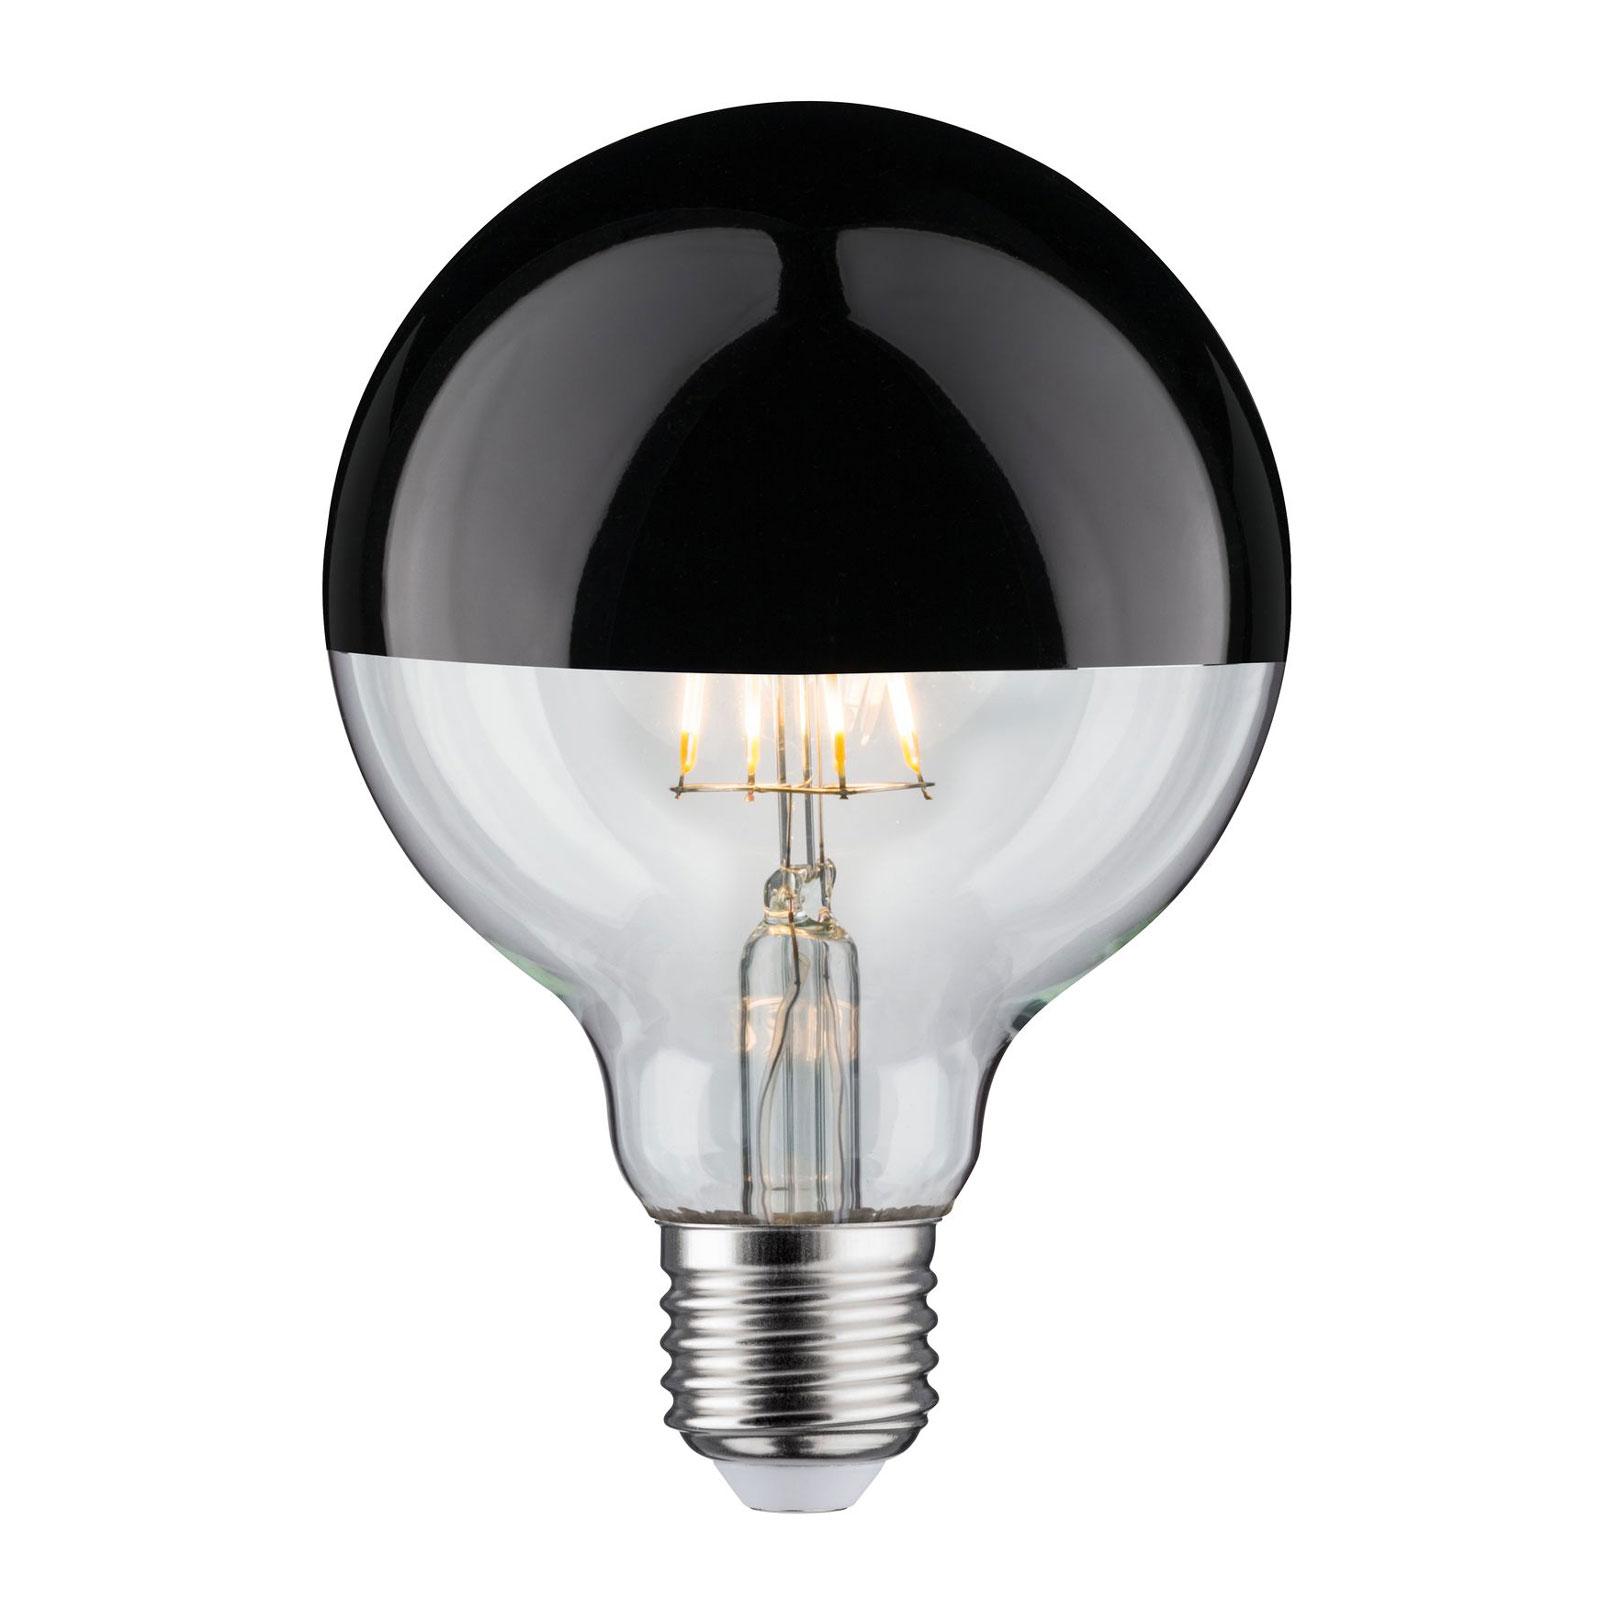 LED-Lampe E27 827 6,5W Kopfspiegel schwarzchrom